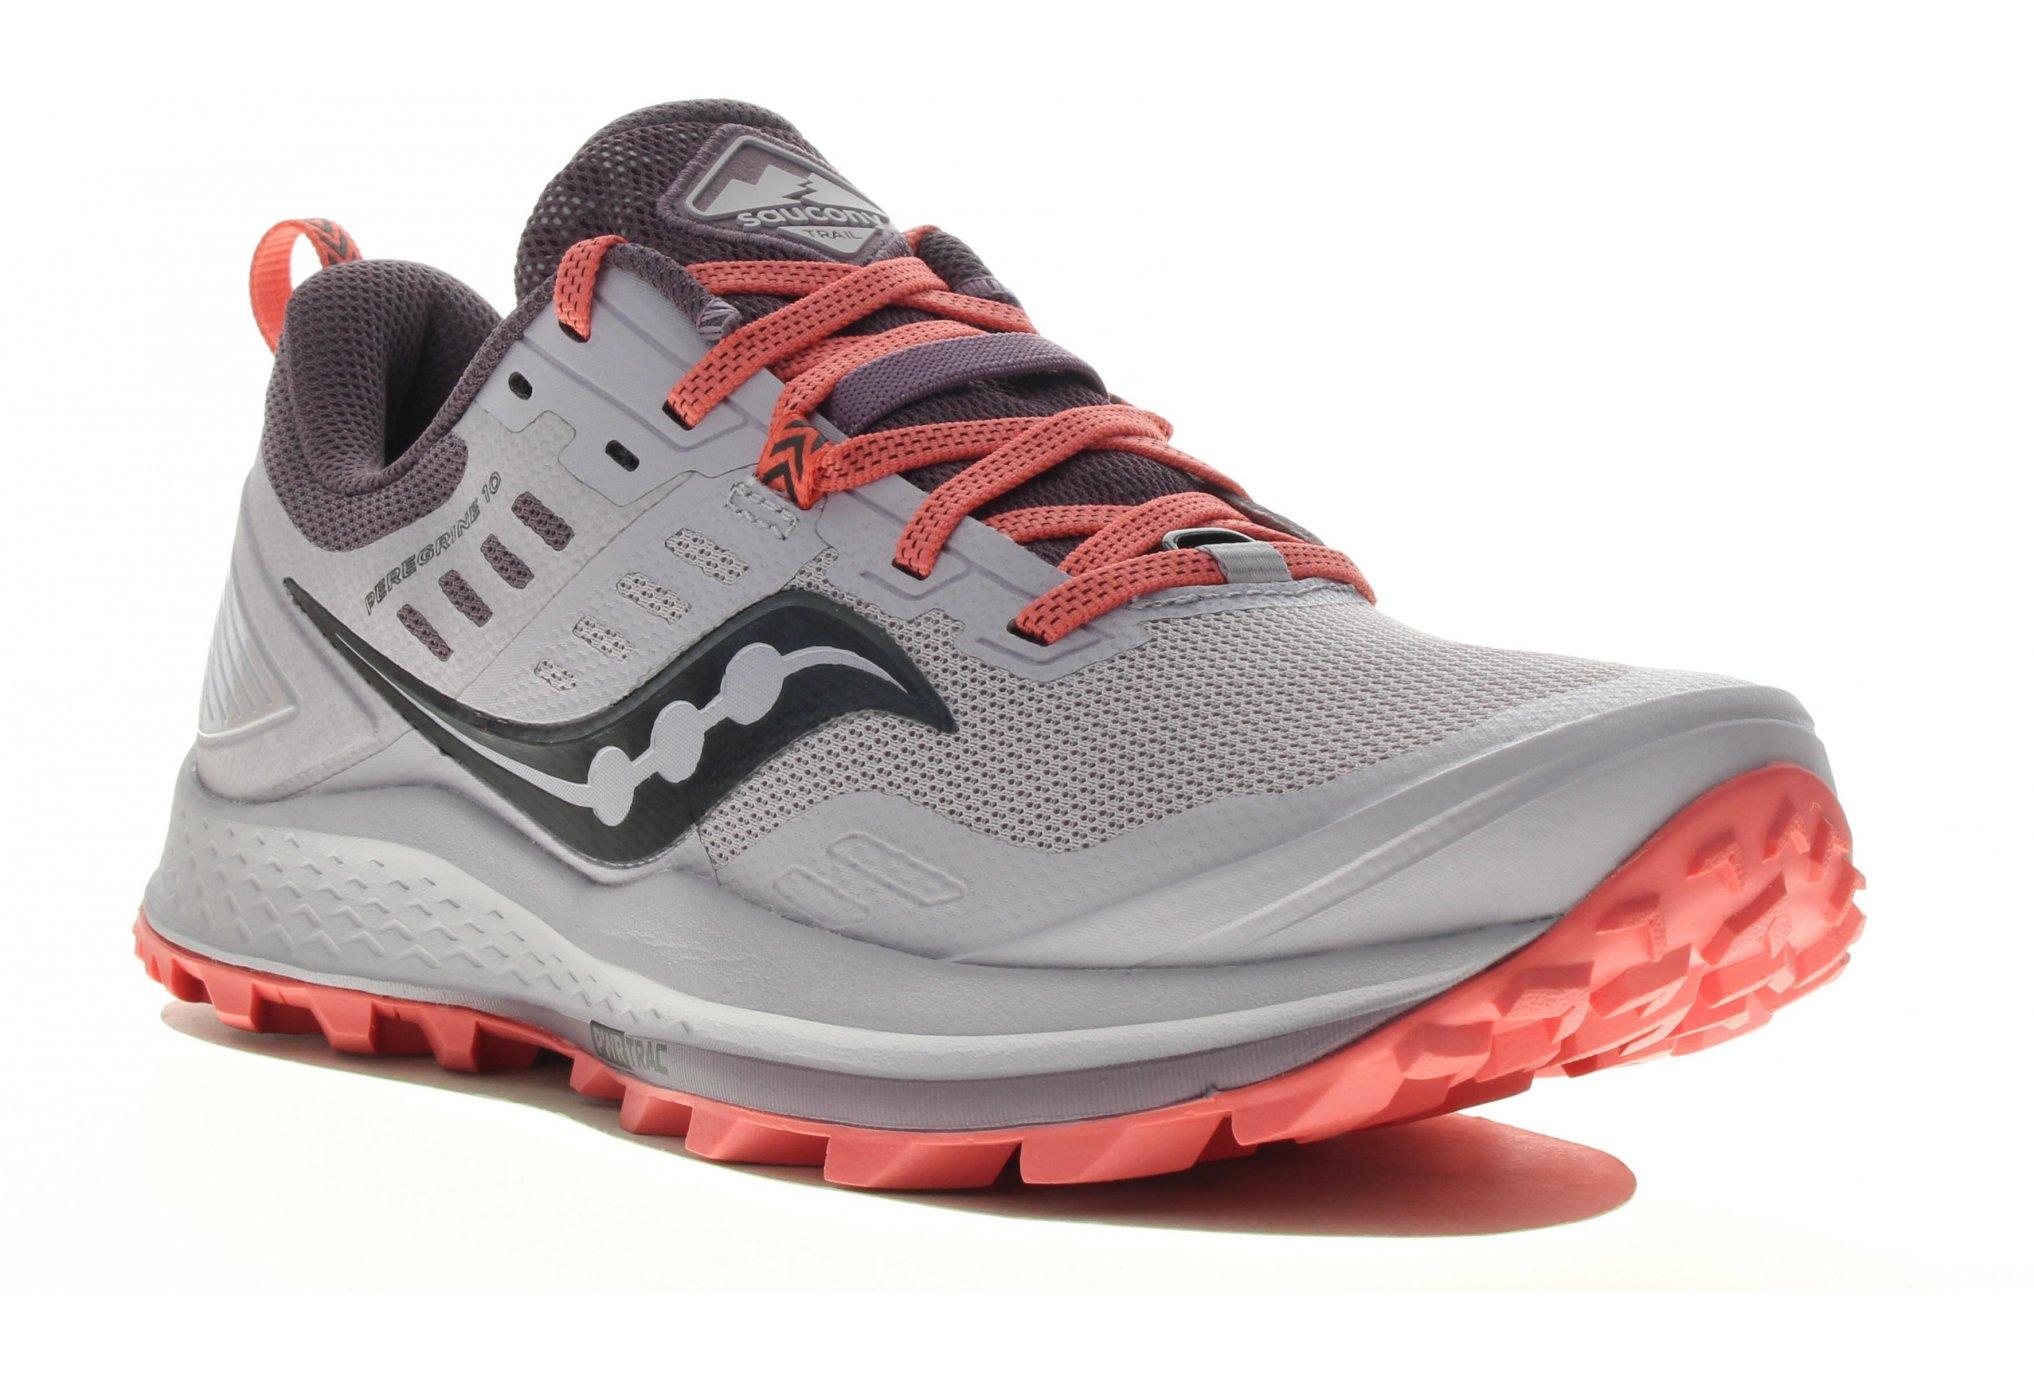 Saucony Peregrine 10 Chaussures running femme